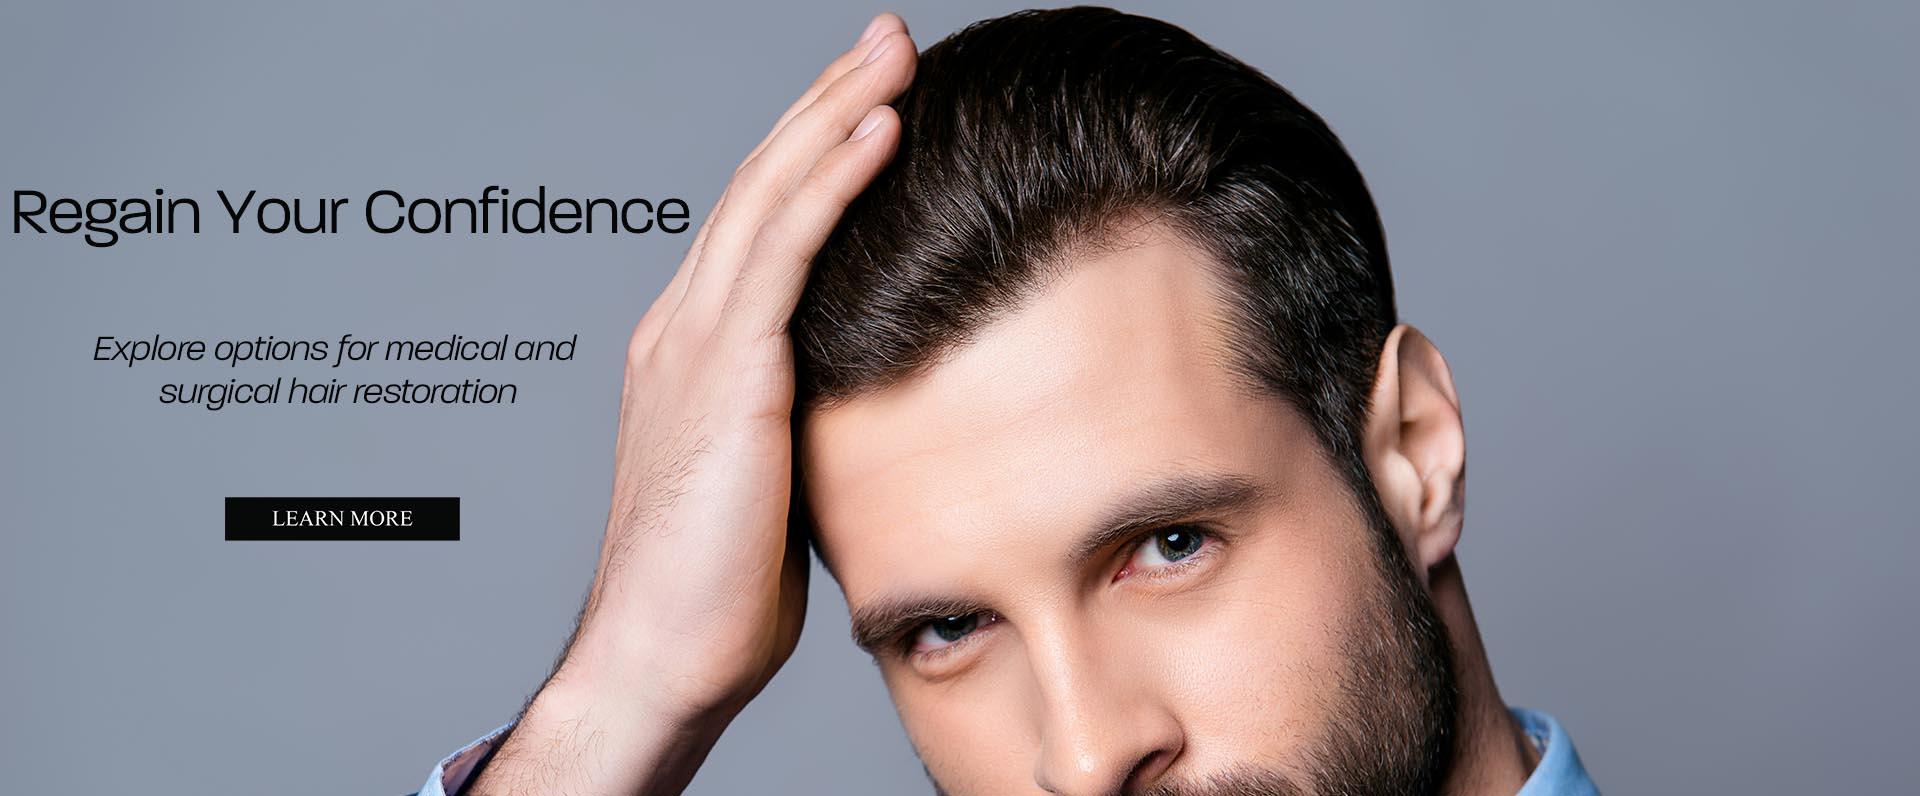 Hair-restoration-redone-1